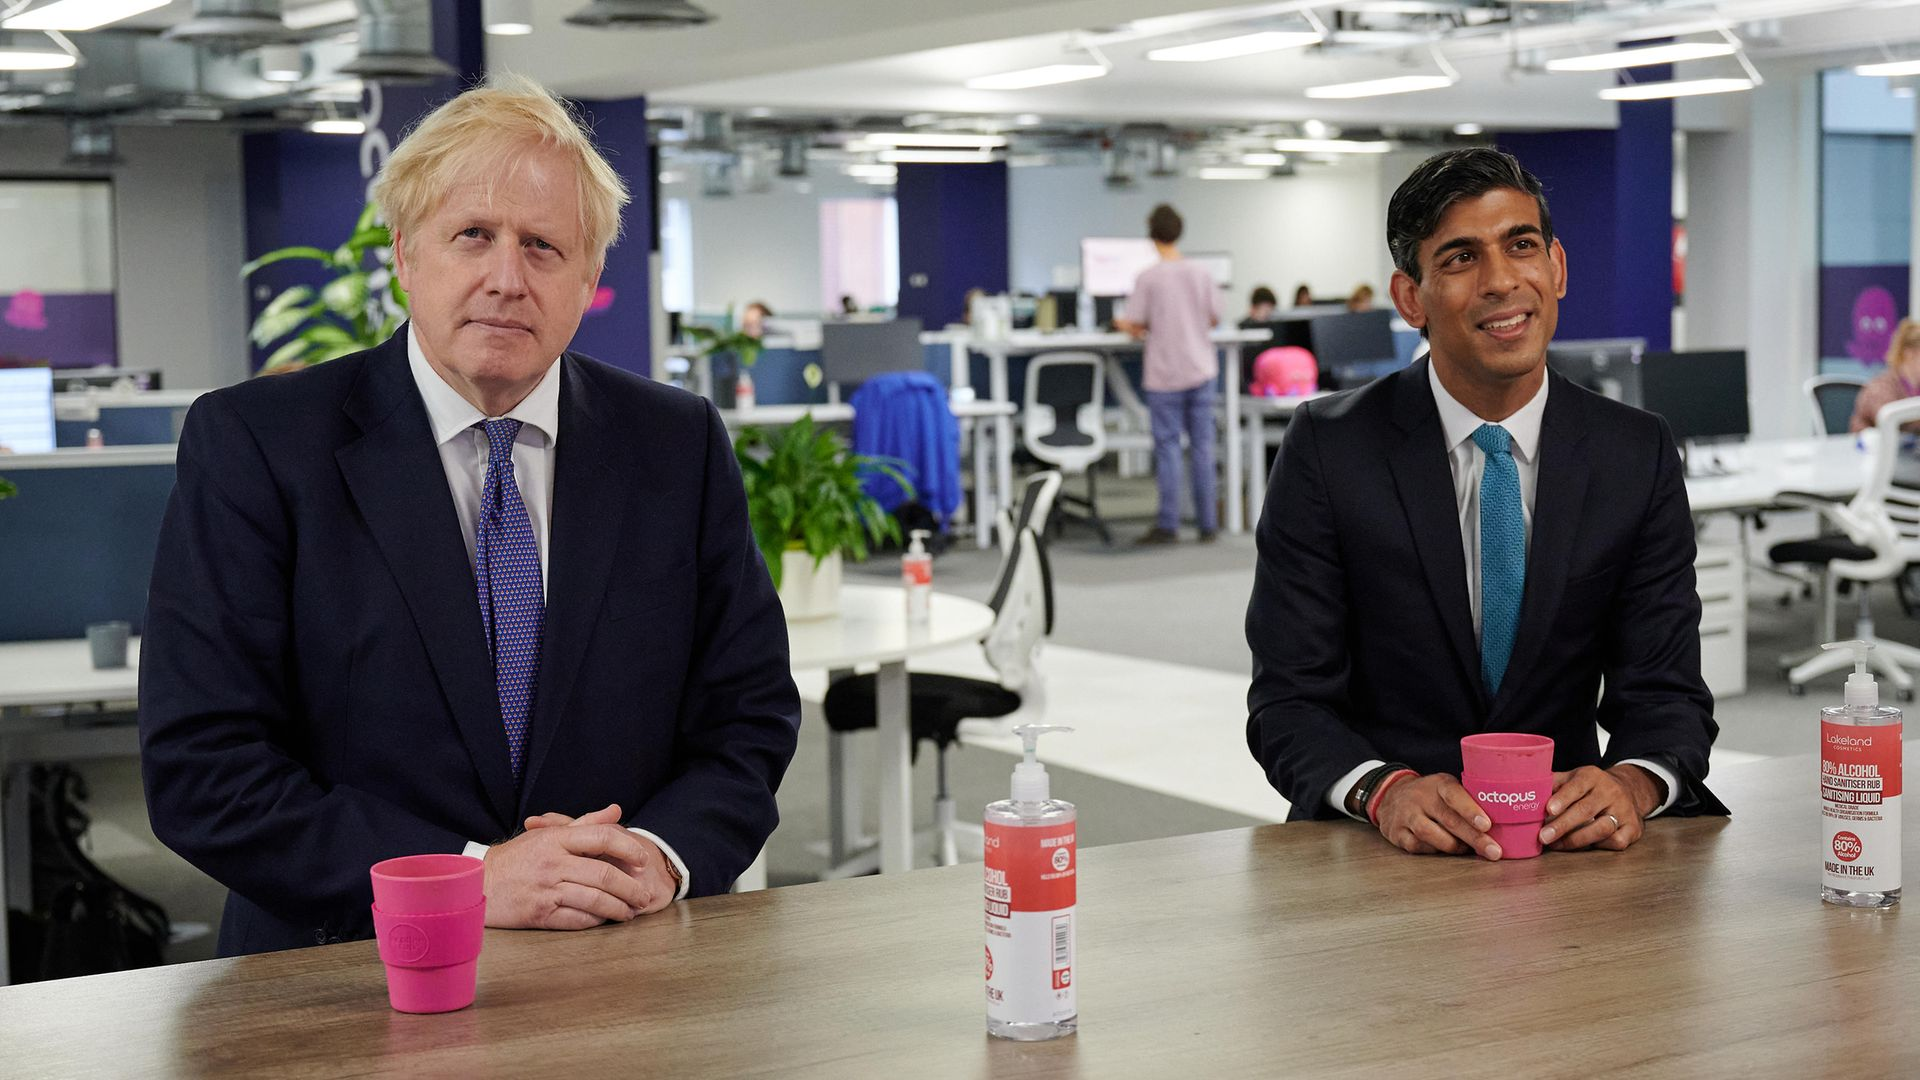 Prime Minister Boris Johnson and Chancellor of the Exchequer Rishi Sunak - Credit: PA